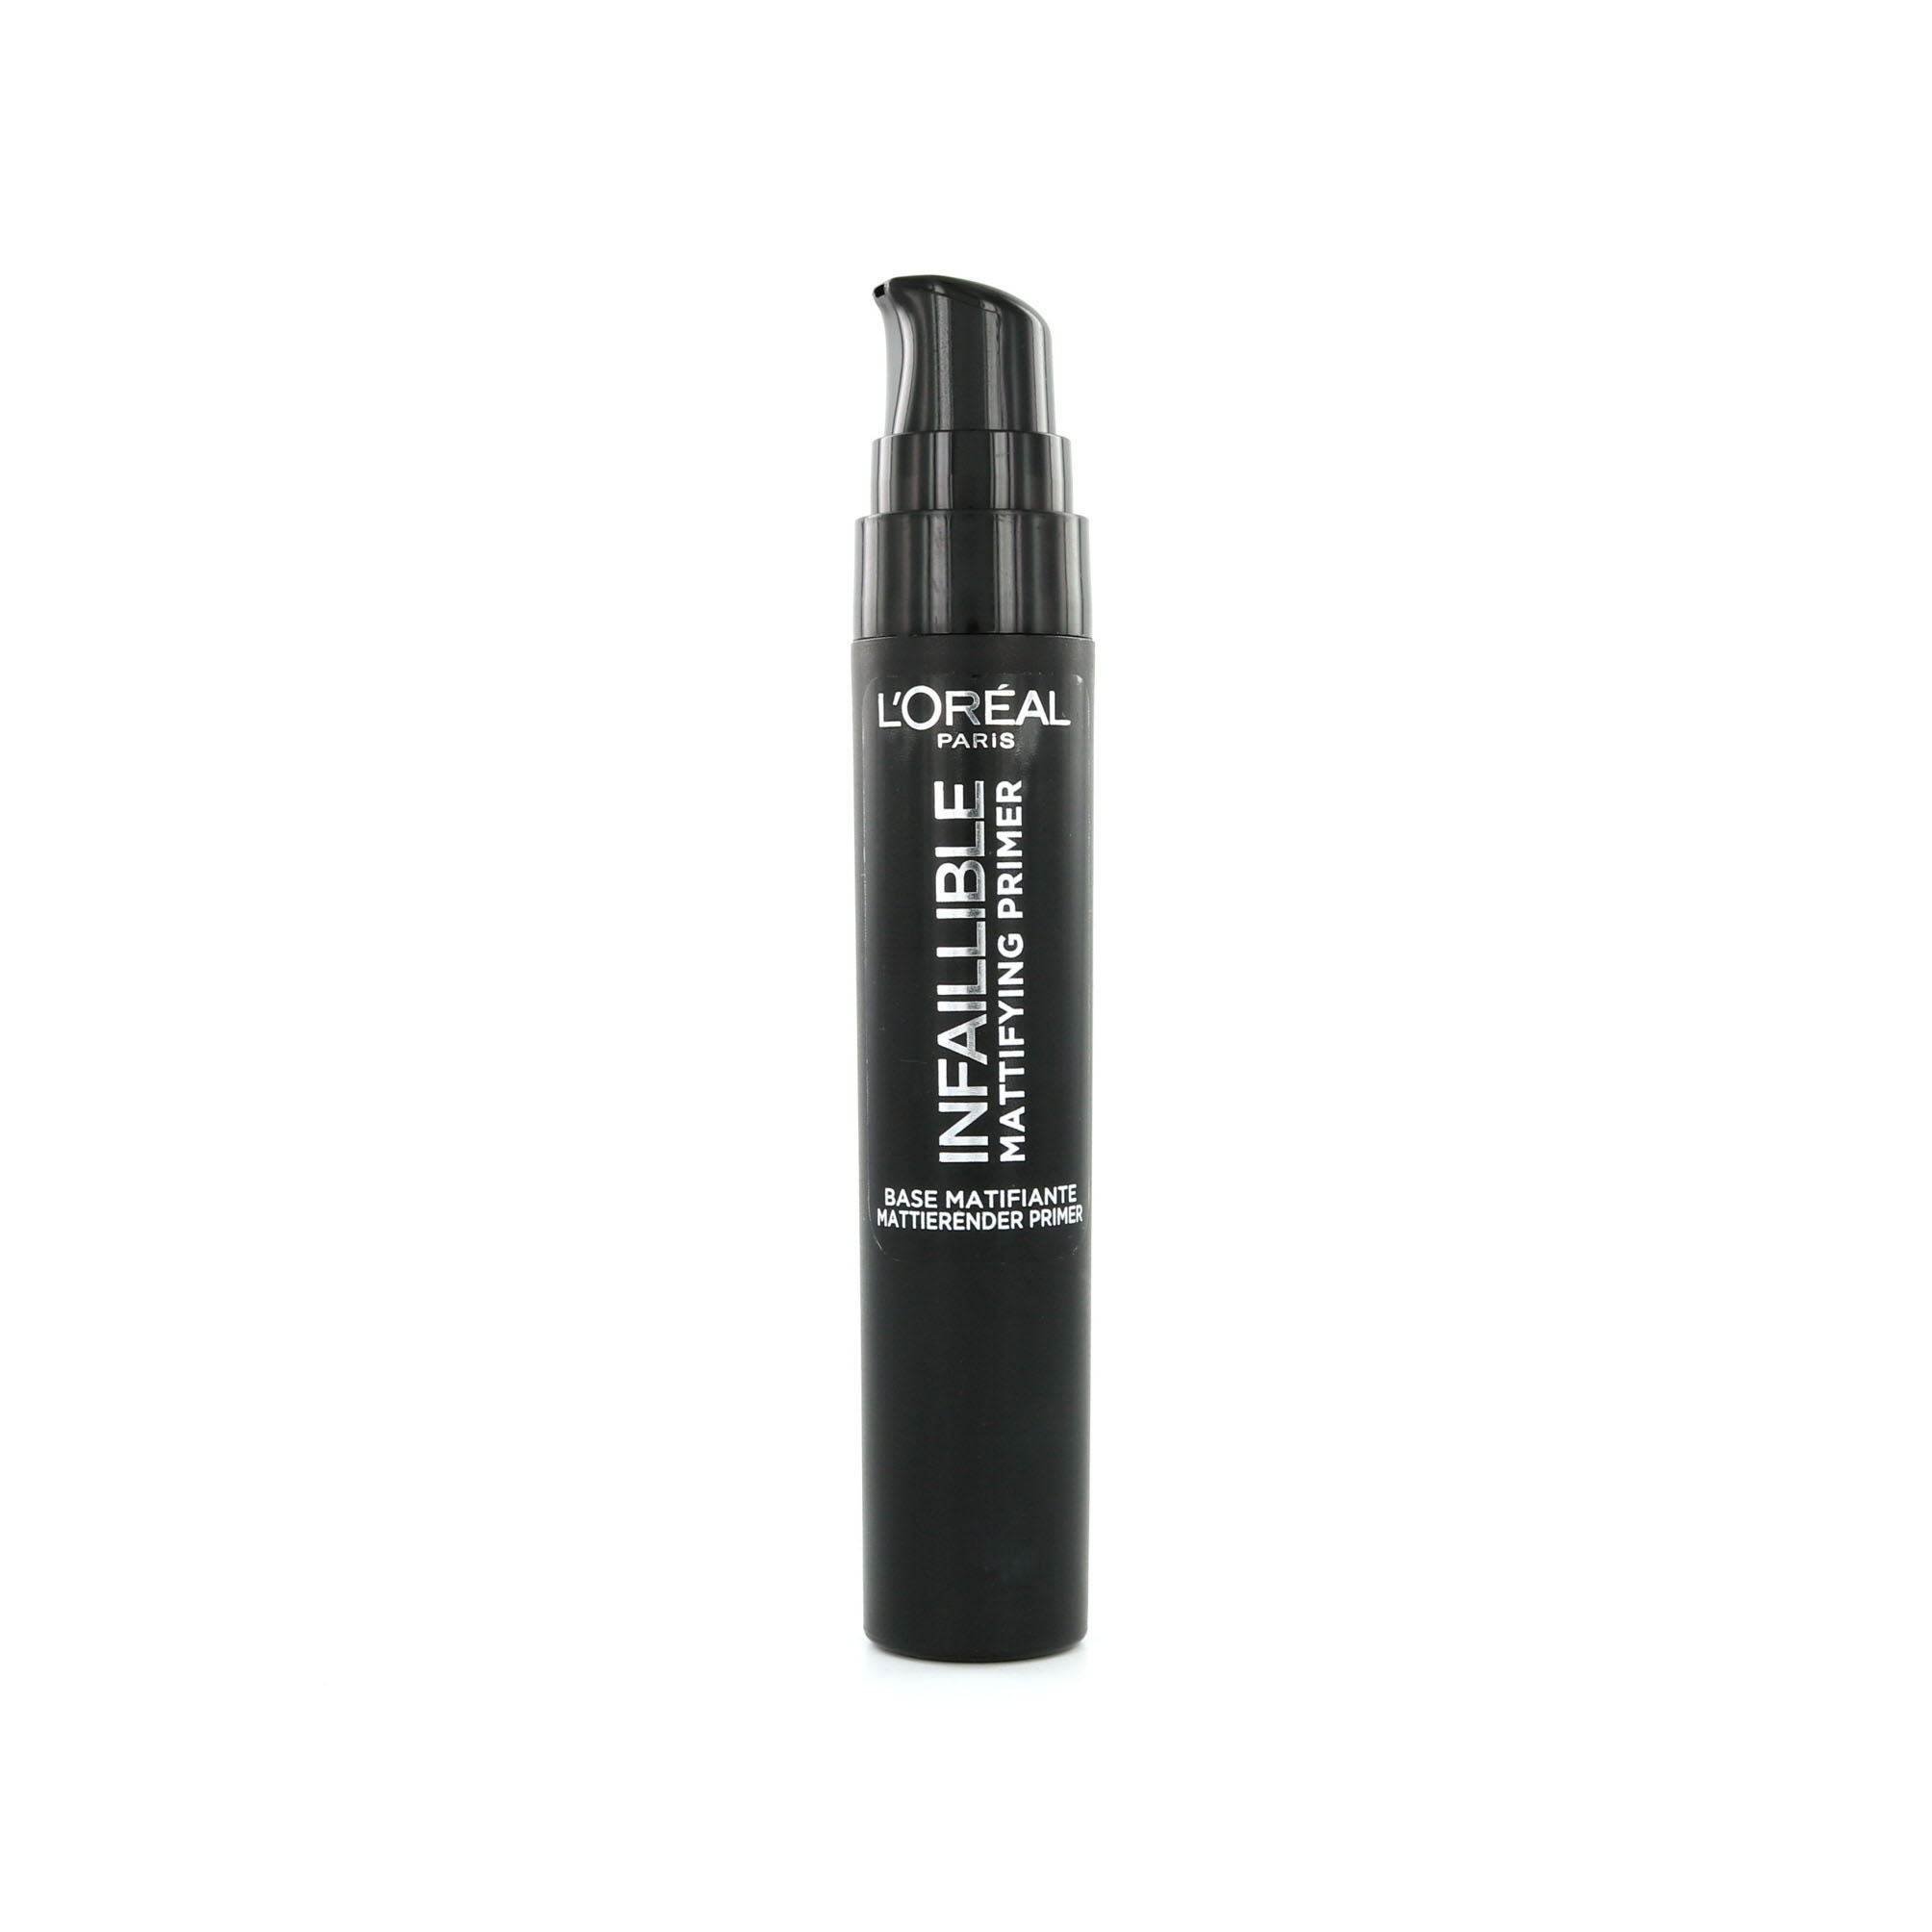 L'Oréal Infallible Mattifying Primer Spray